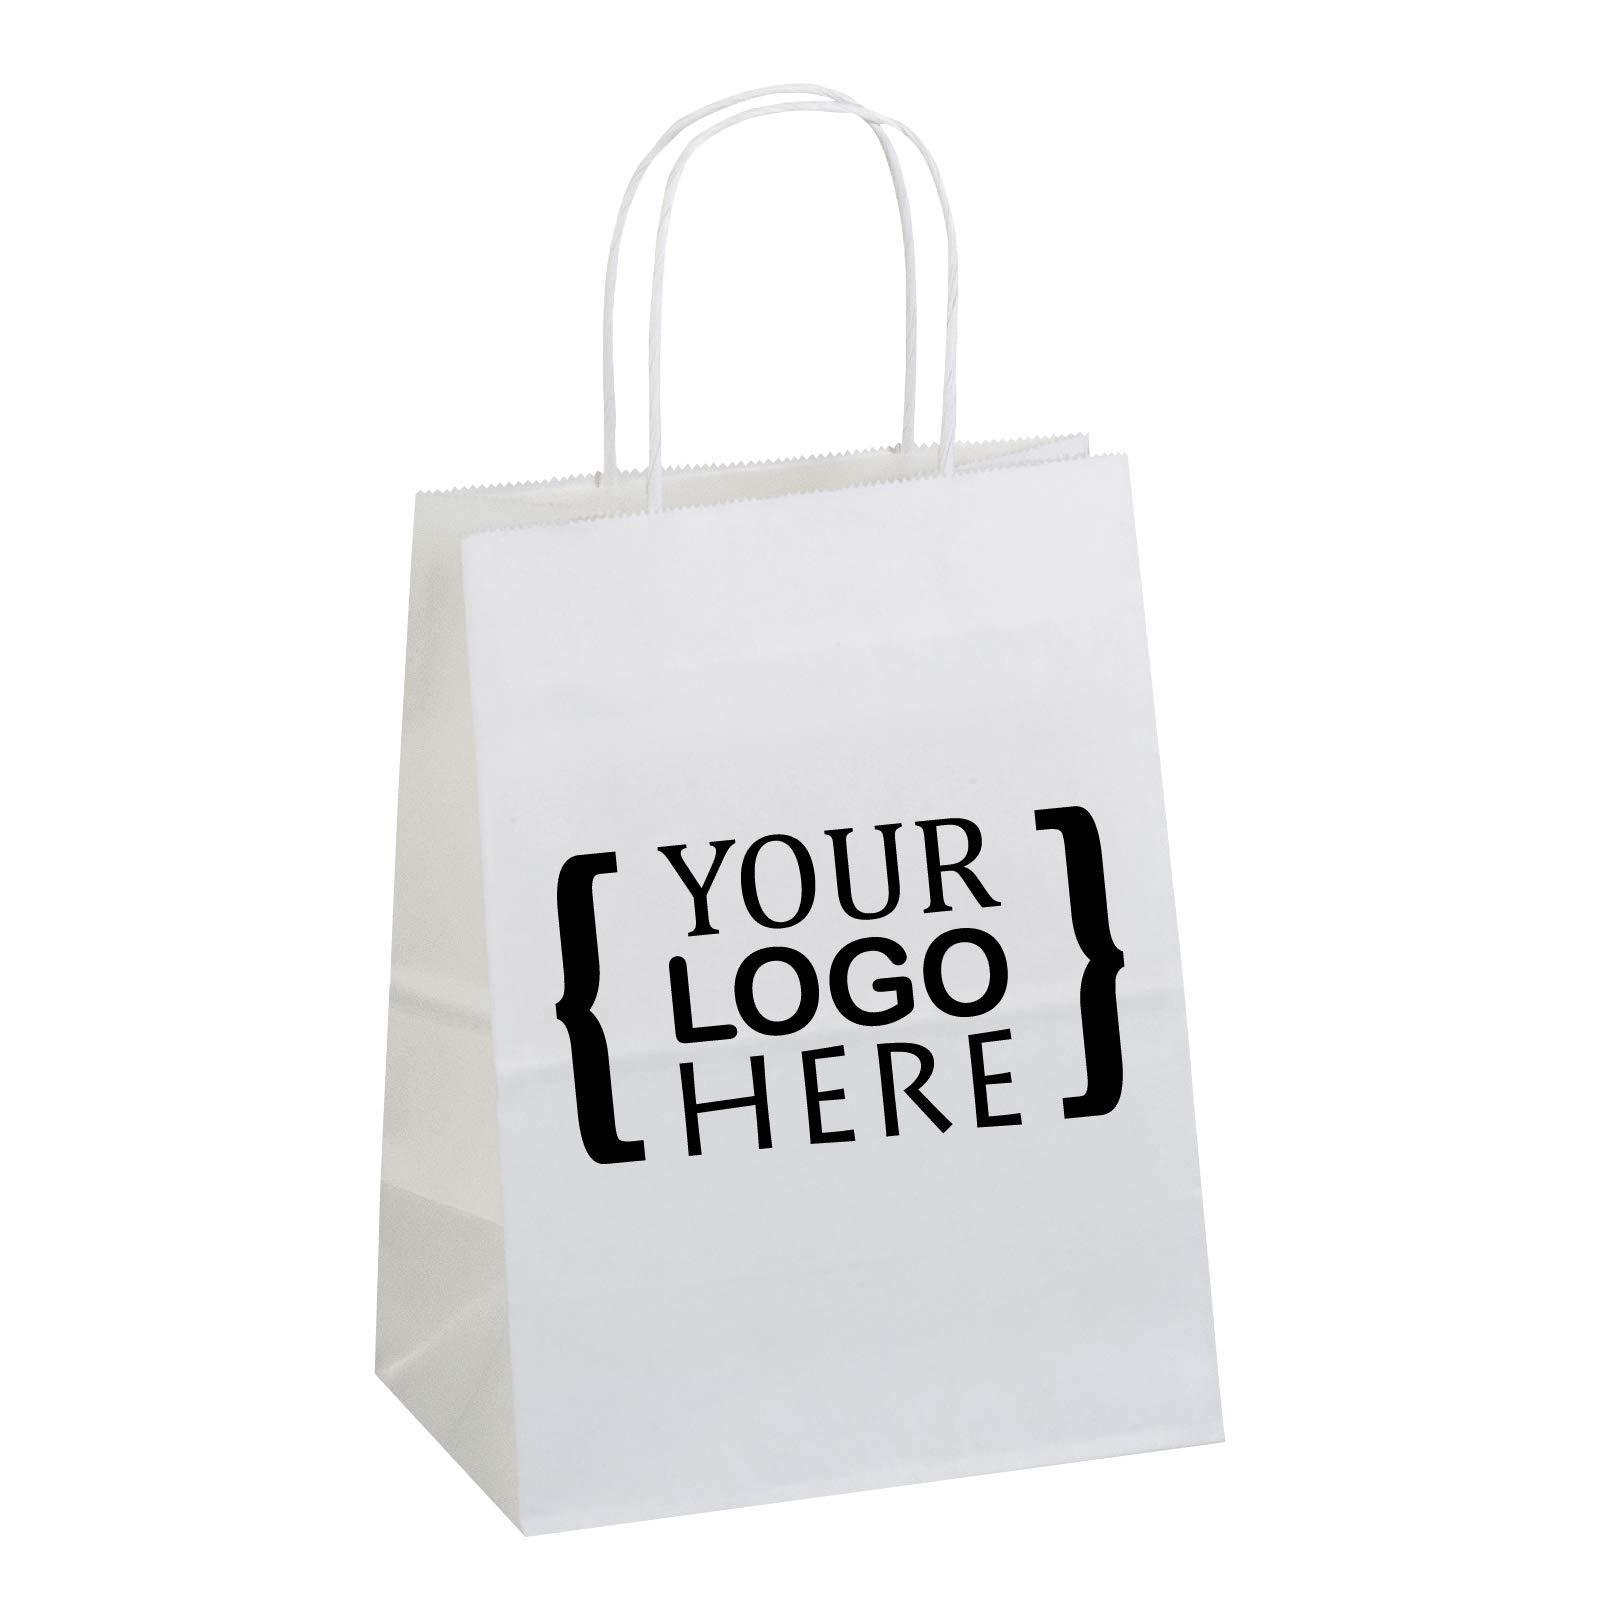 Flexicore Packaging 8''x4.75''x10'' - 100 Pcs White Kraft Paper Bags, Shopping, Merchandise, Party, Gift Bags, (1